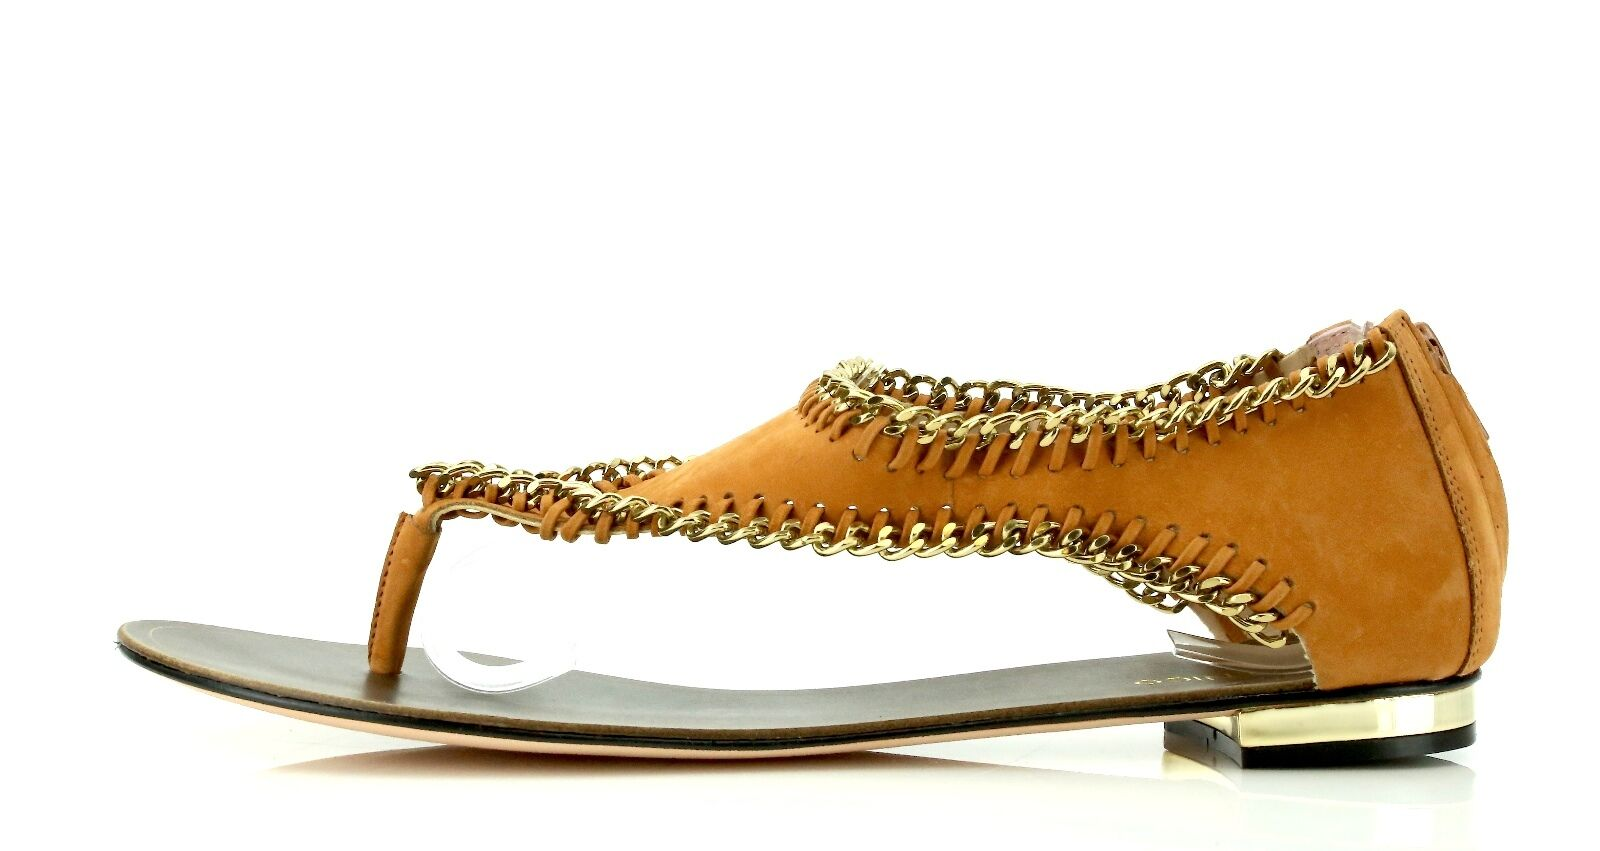 Klub Nico JORDAN Carmel Brown Suede T-Strap Sandals 7135 Size 8 M NEW